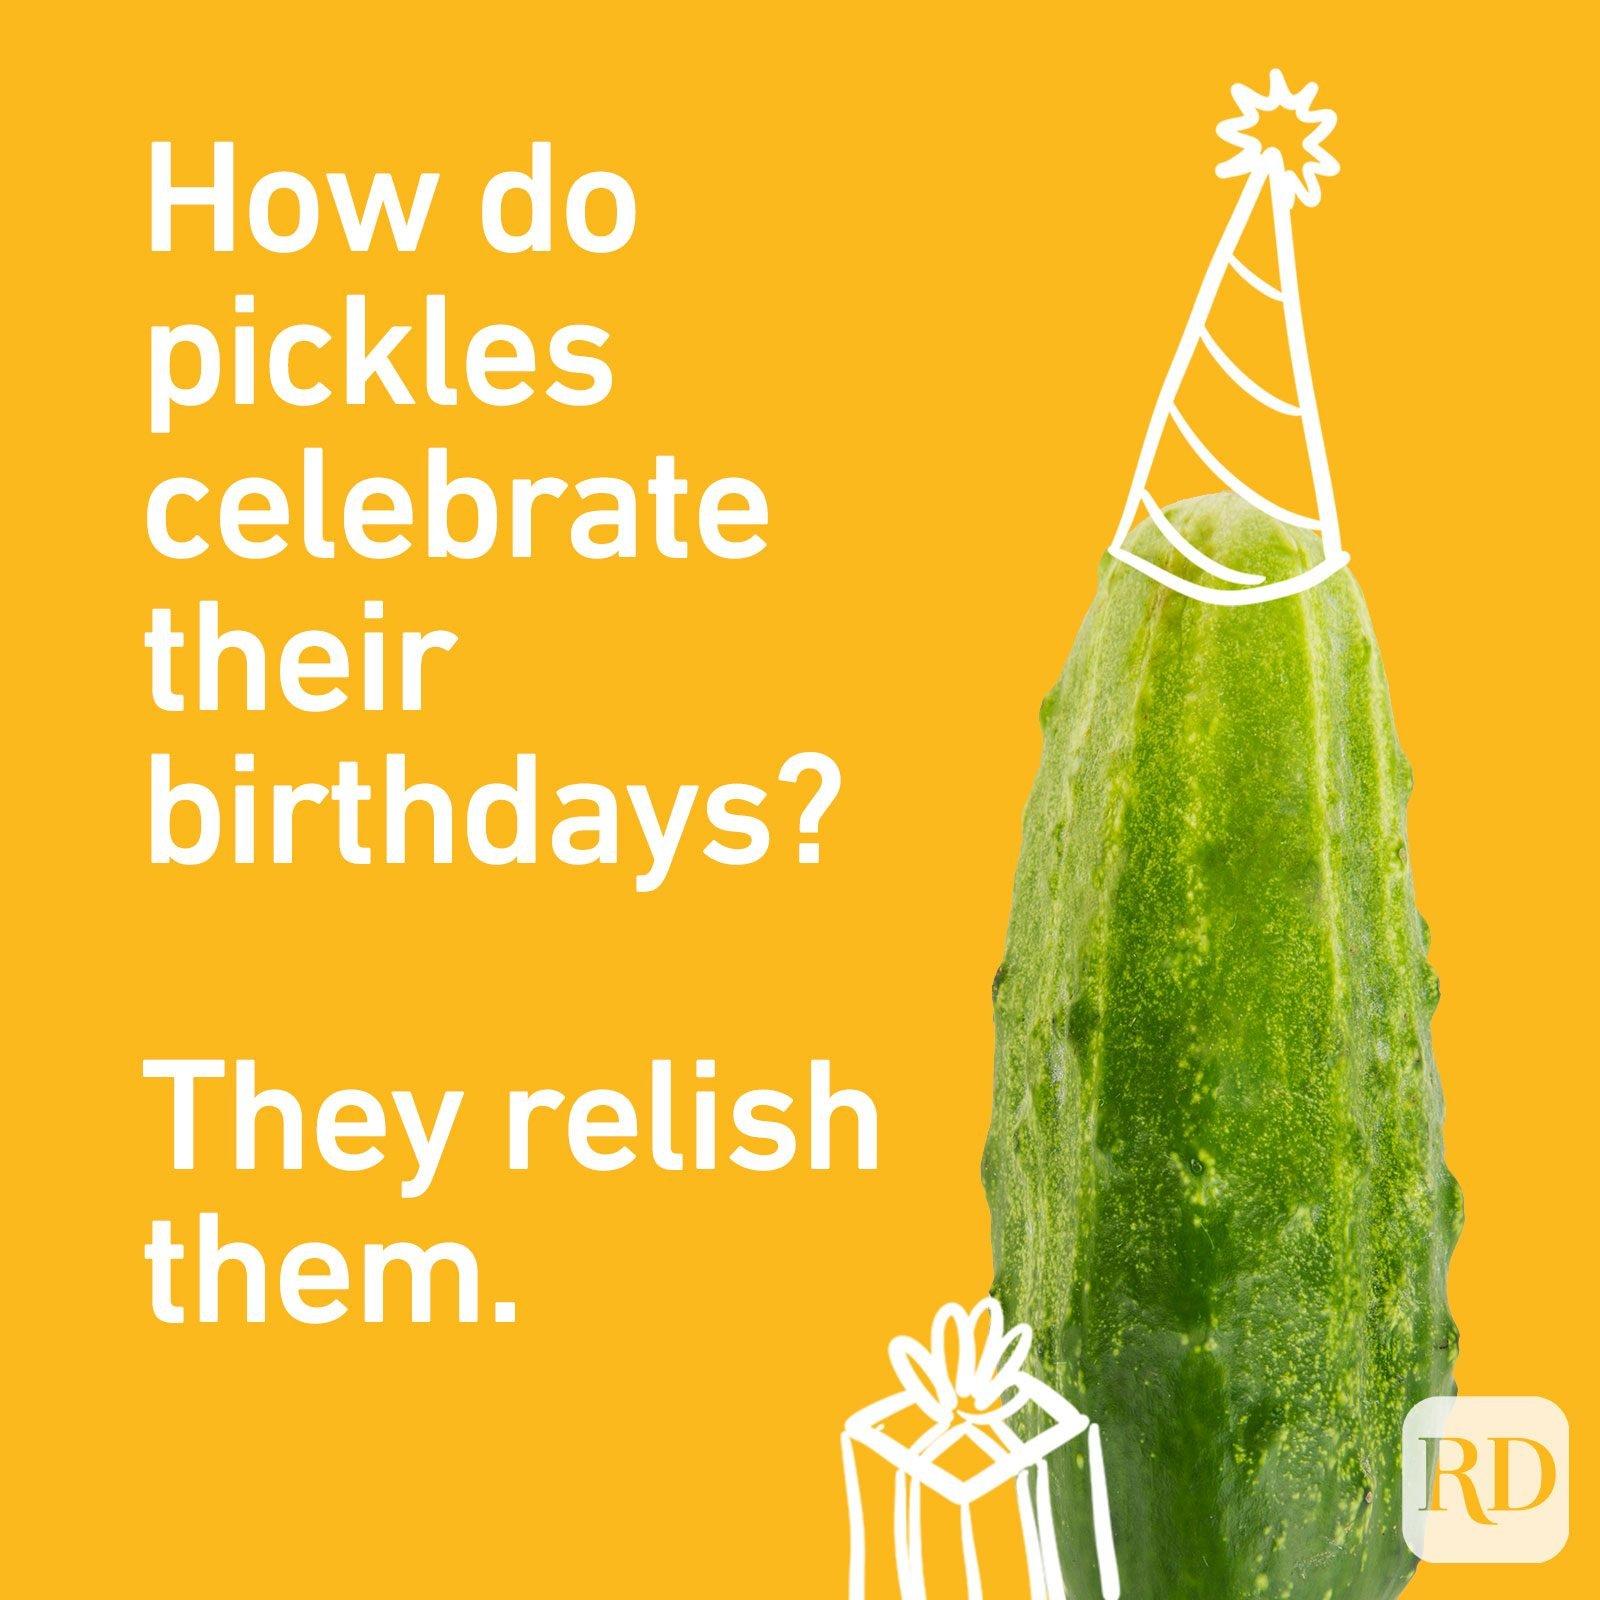 How do pickles celebrate their birthdays? They relish them.